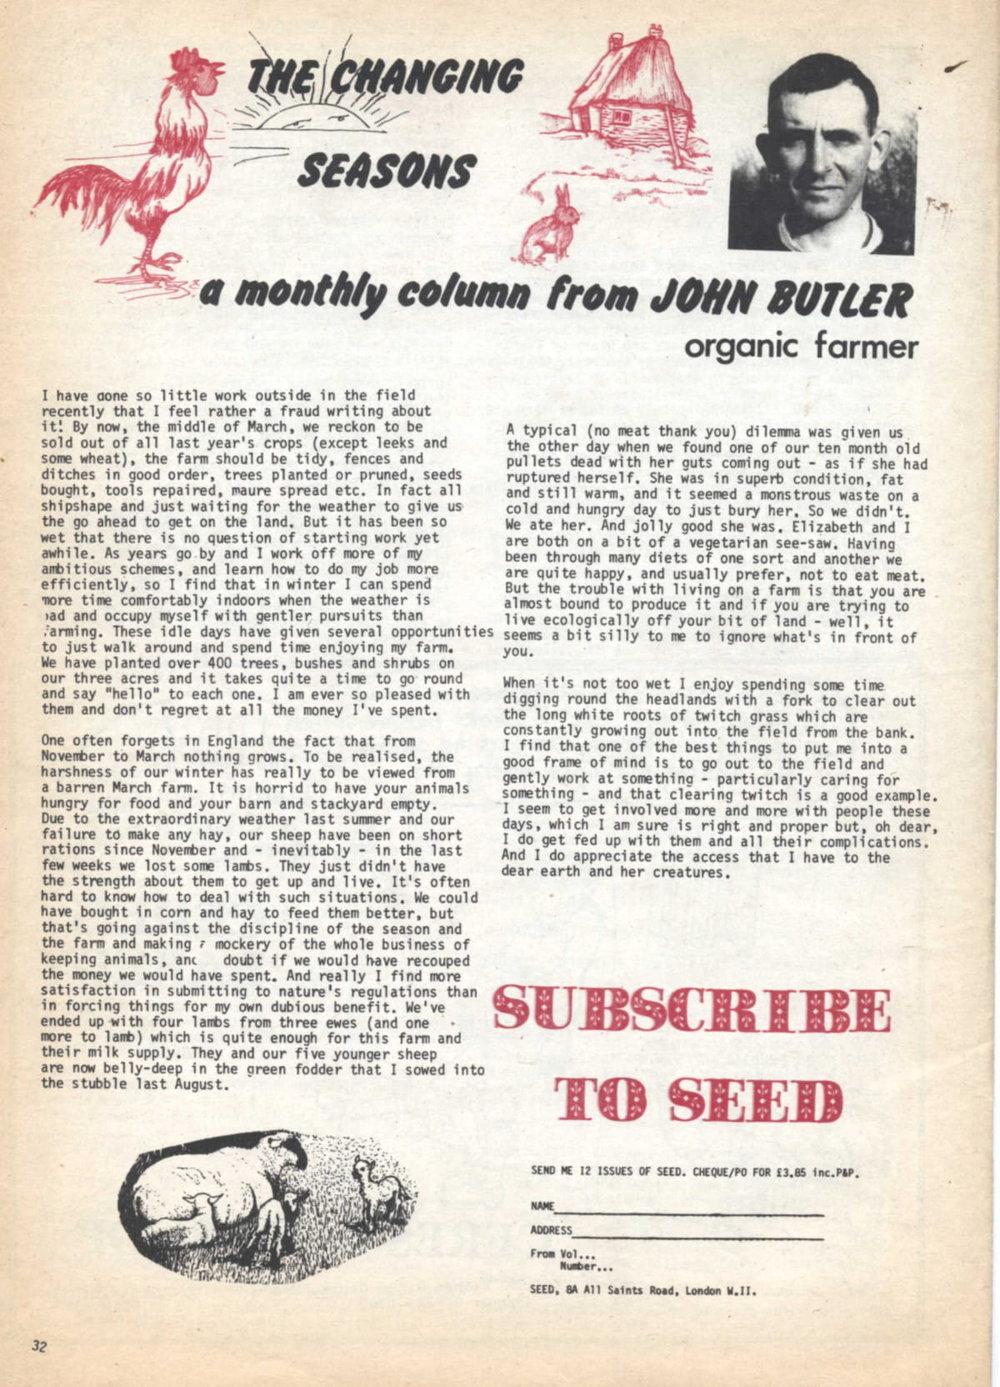 seed-v4-n5-may1975-32.jpg